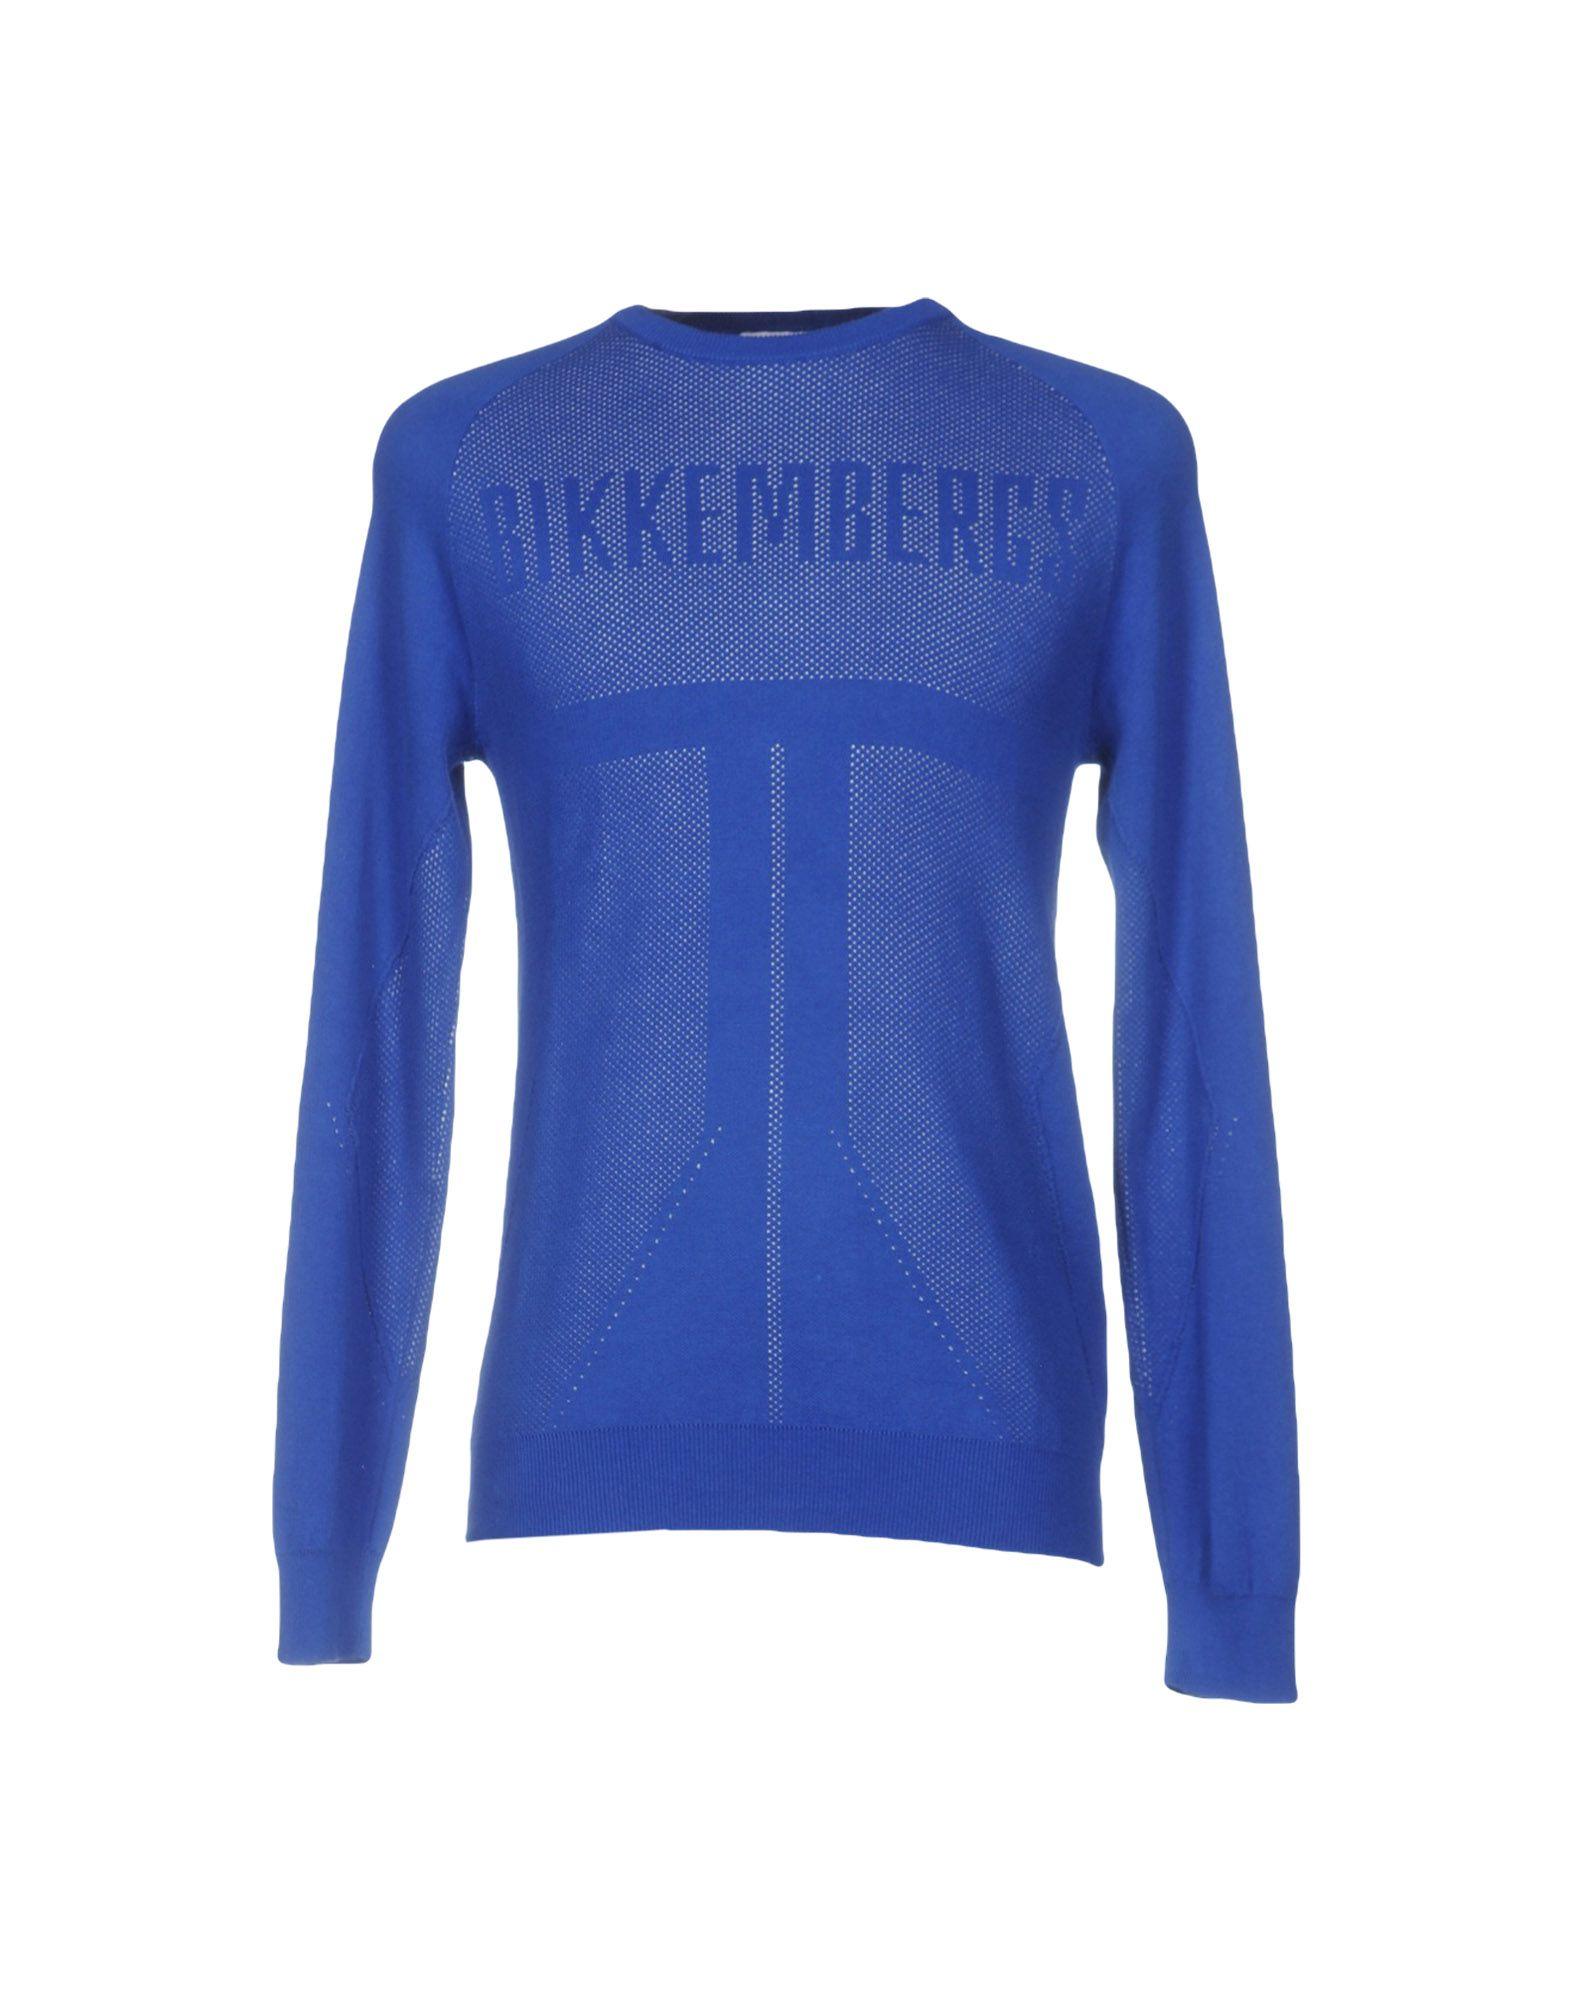 Pullover Bikkembergs Uomo - Acquista online su